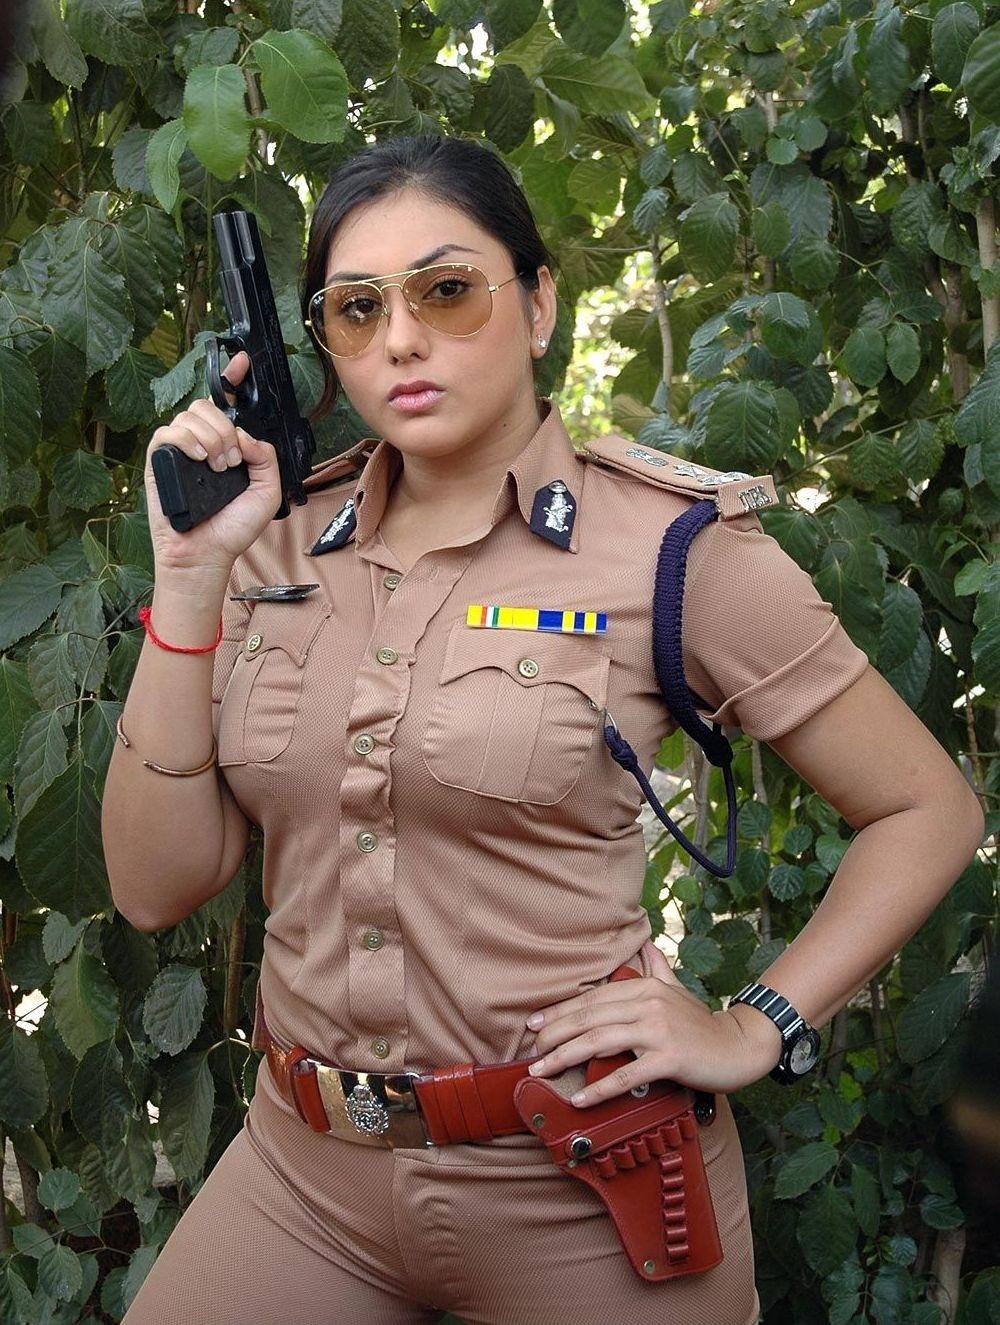 4 police girl oil mexican border patrol 6